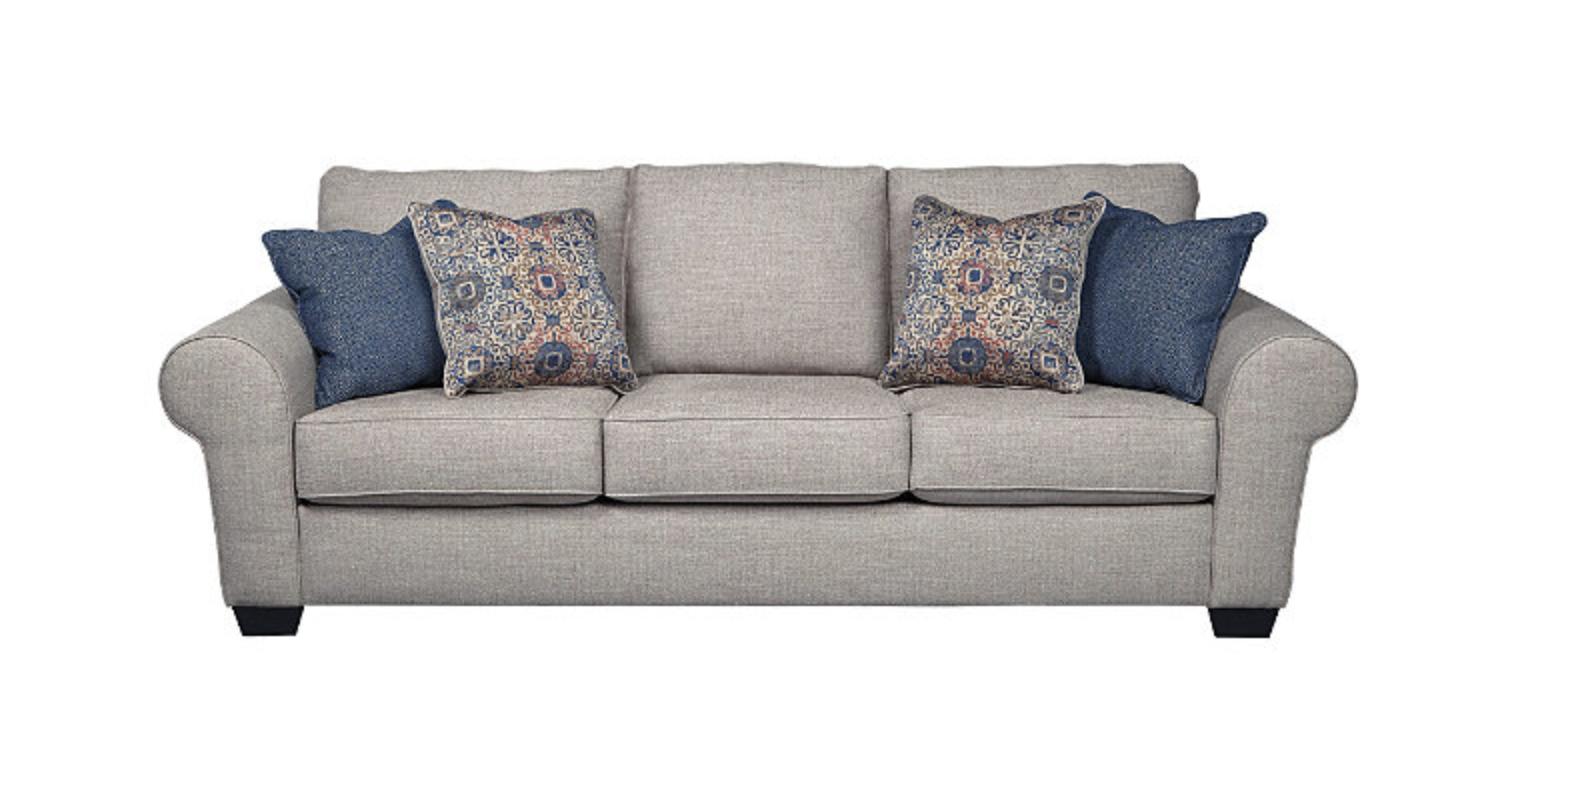 Fabulous Belcampo Queen Sofa Sleeper 900 Want Sleeper Sofa Sofa Ncnpc Chair Design For Home Ncnpcorg